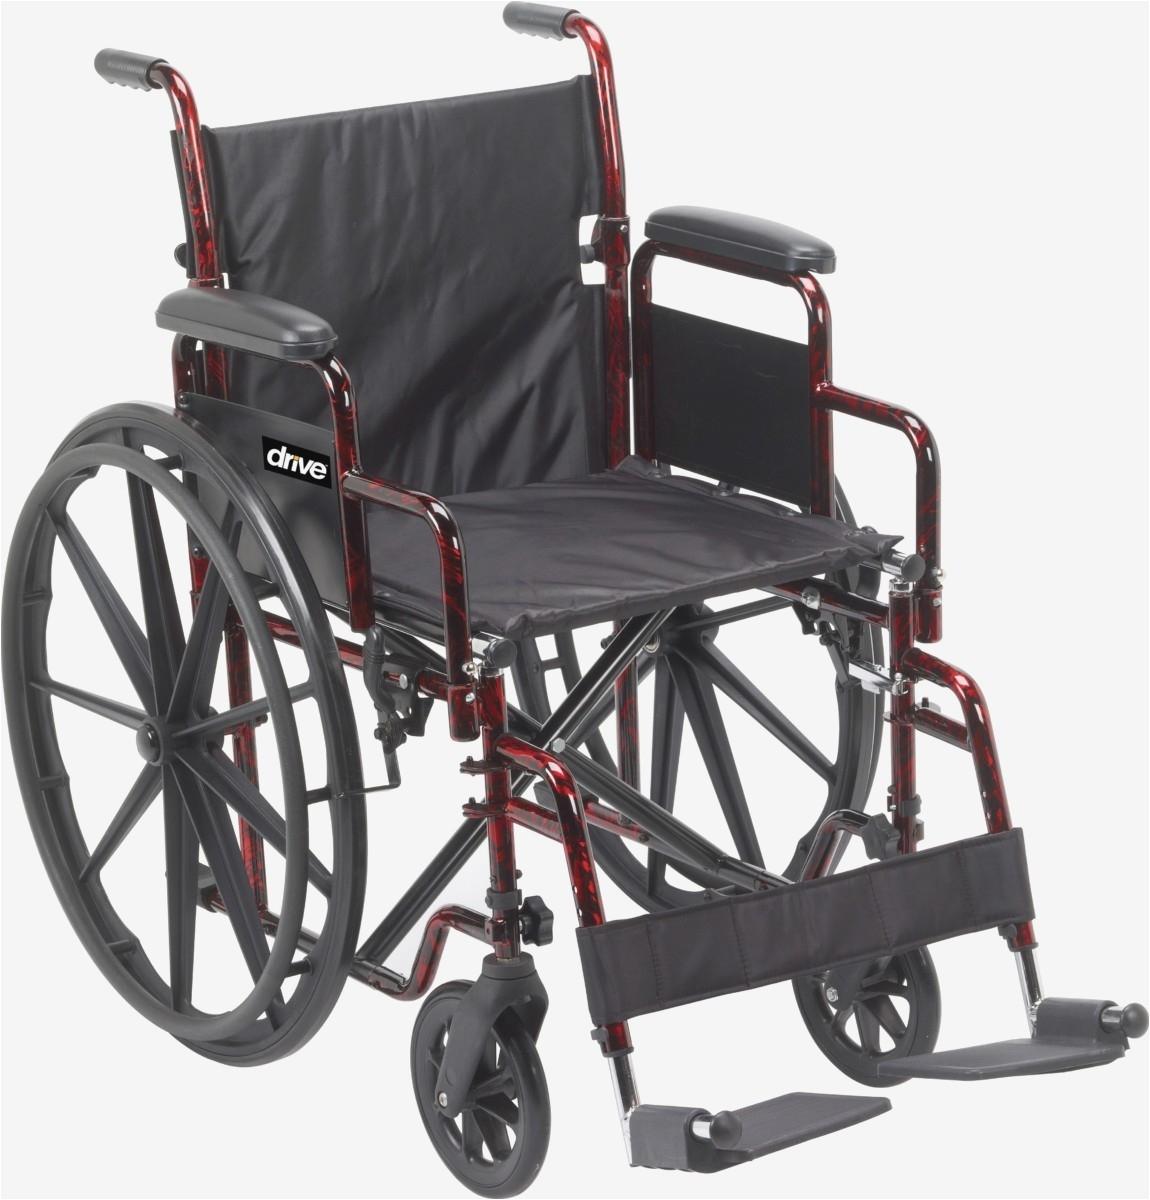 23 minimalist transport chairs lightweight elegant chair furniture decorating style ideas